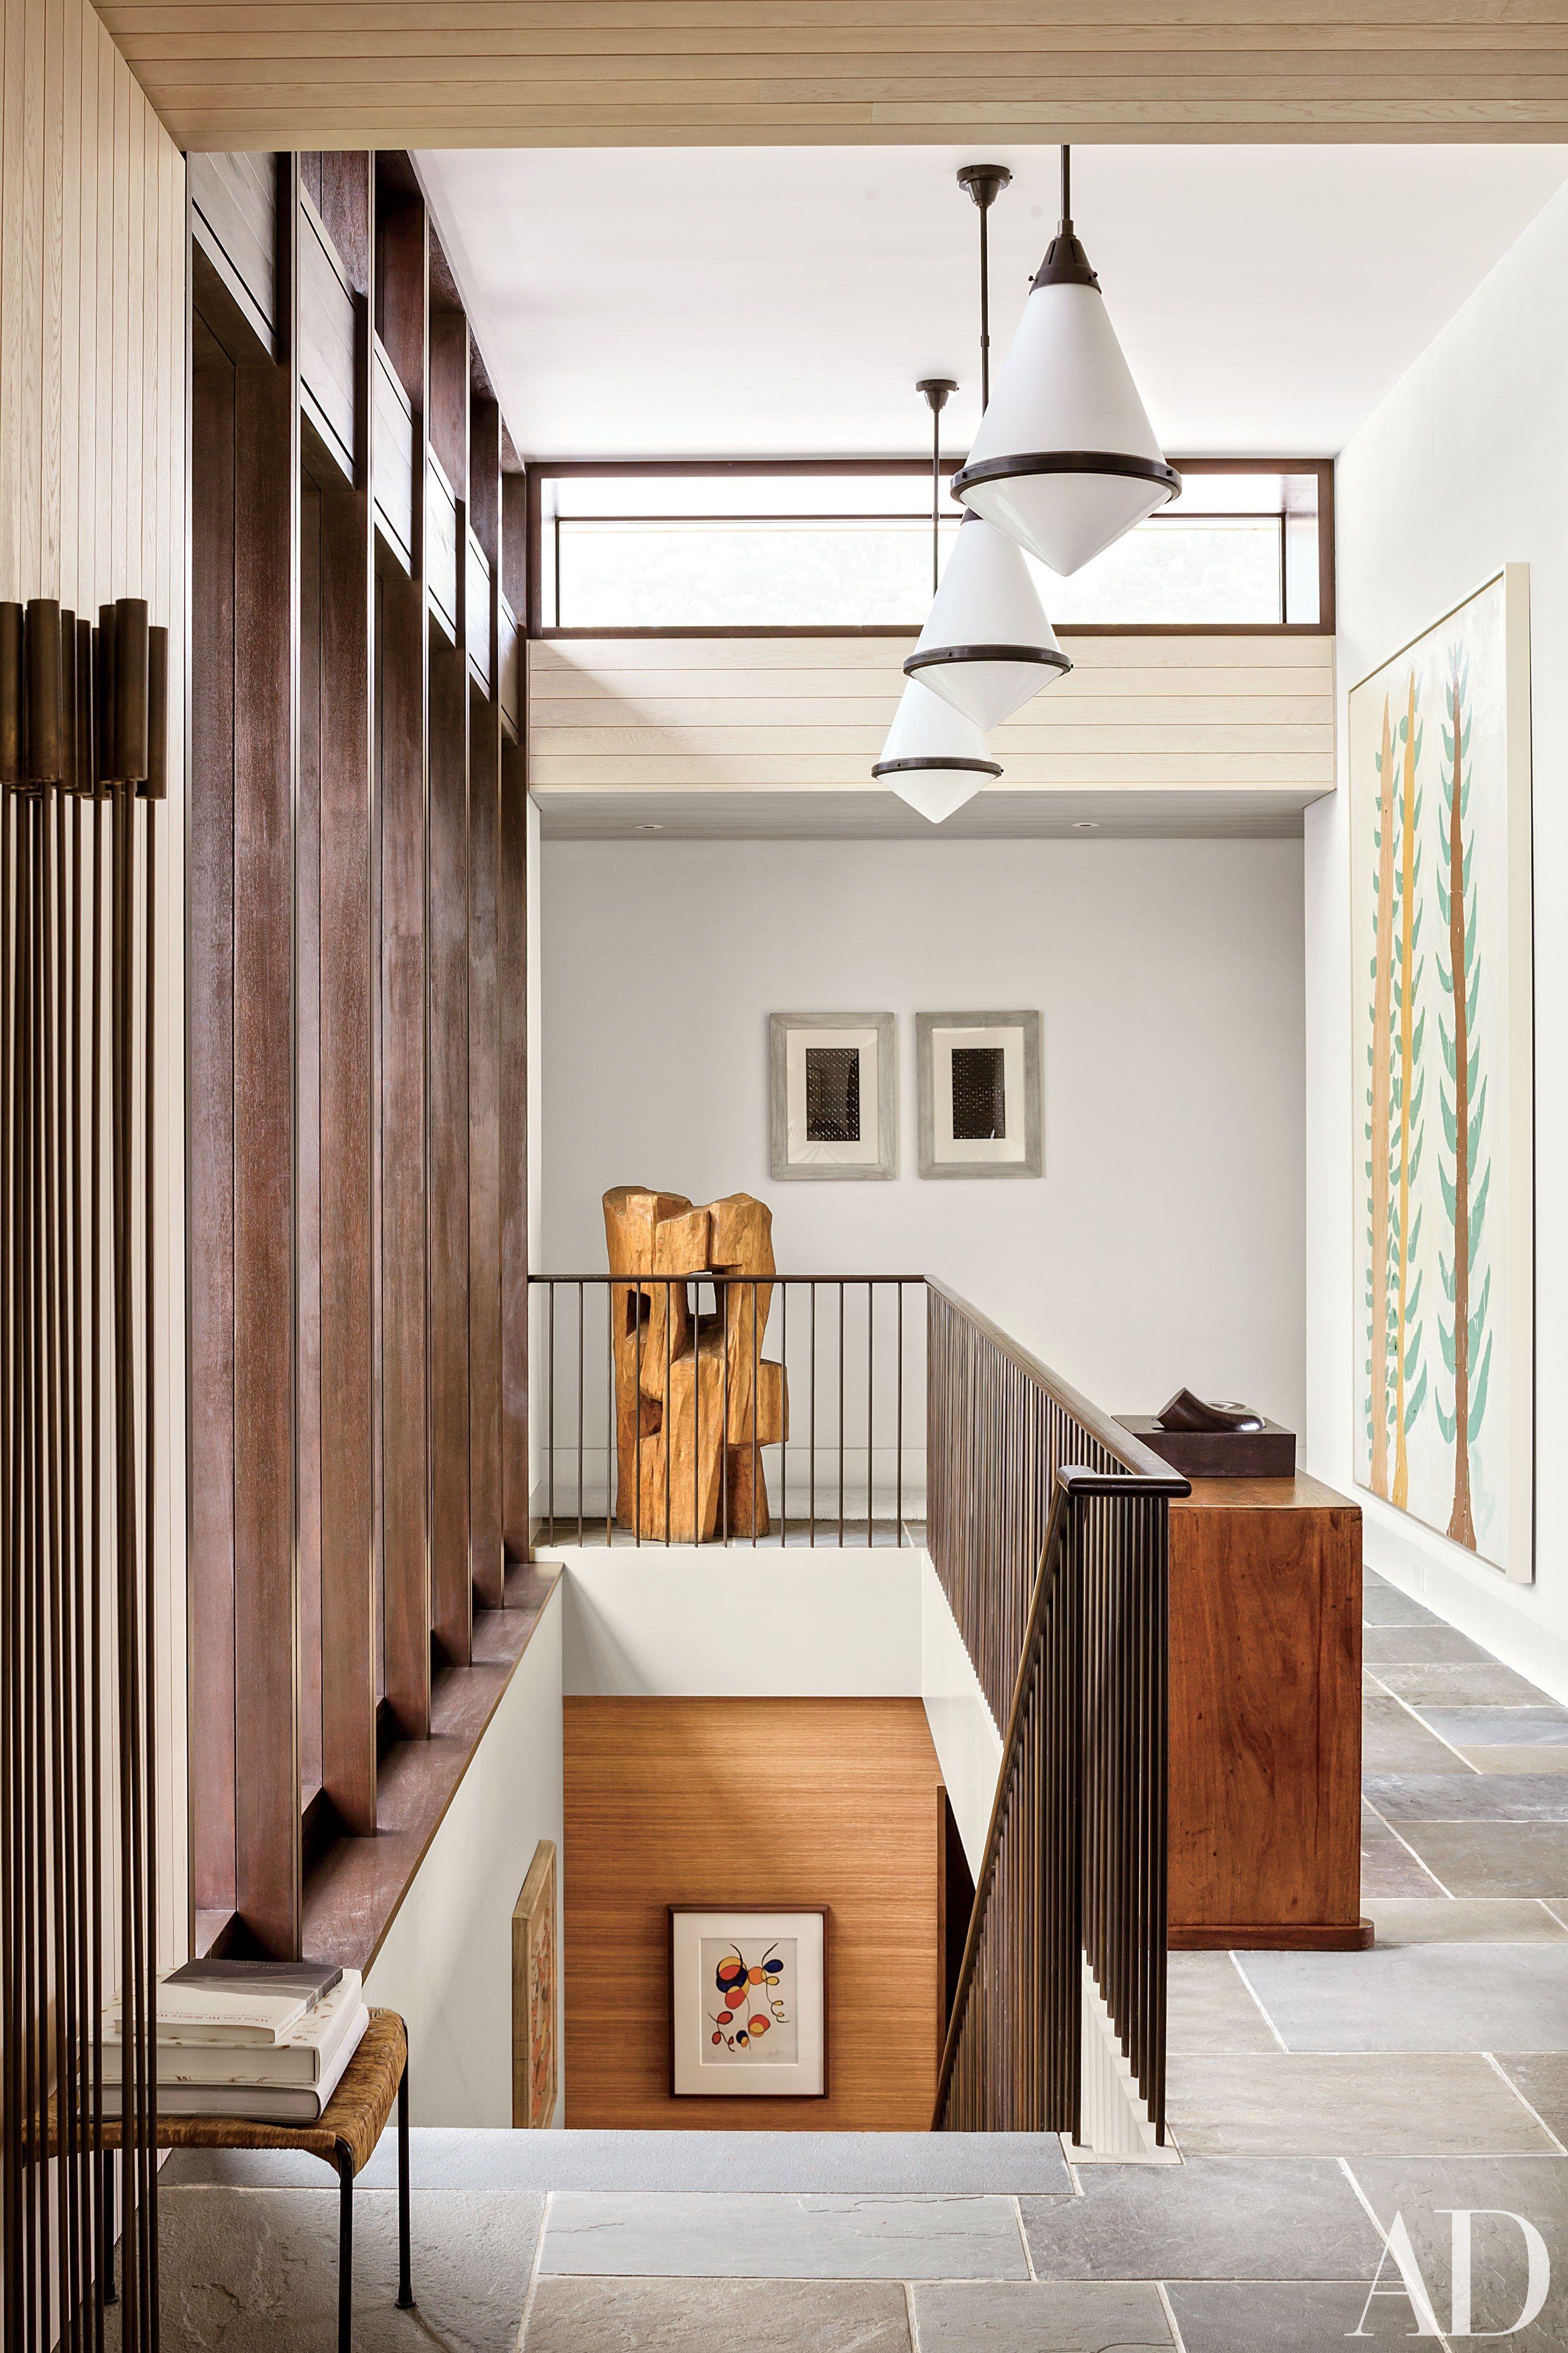 33 Entrances Halls That Make A Stylish First Impression | Entrance Halls,  Architectural Digest And Hall